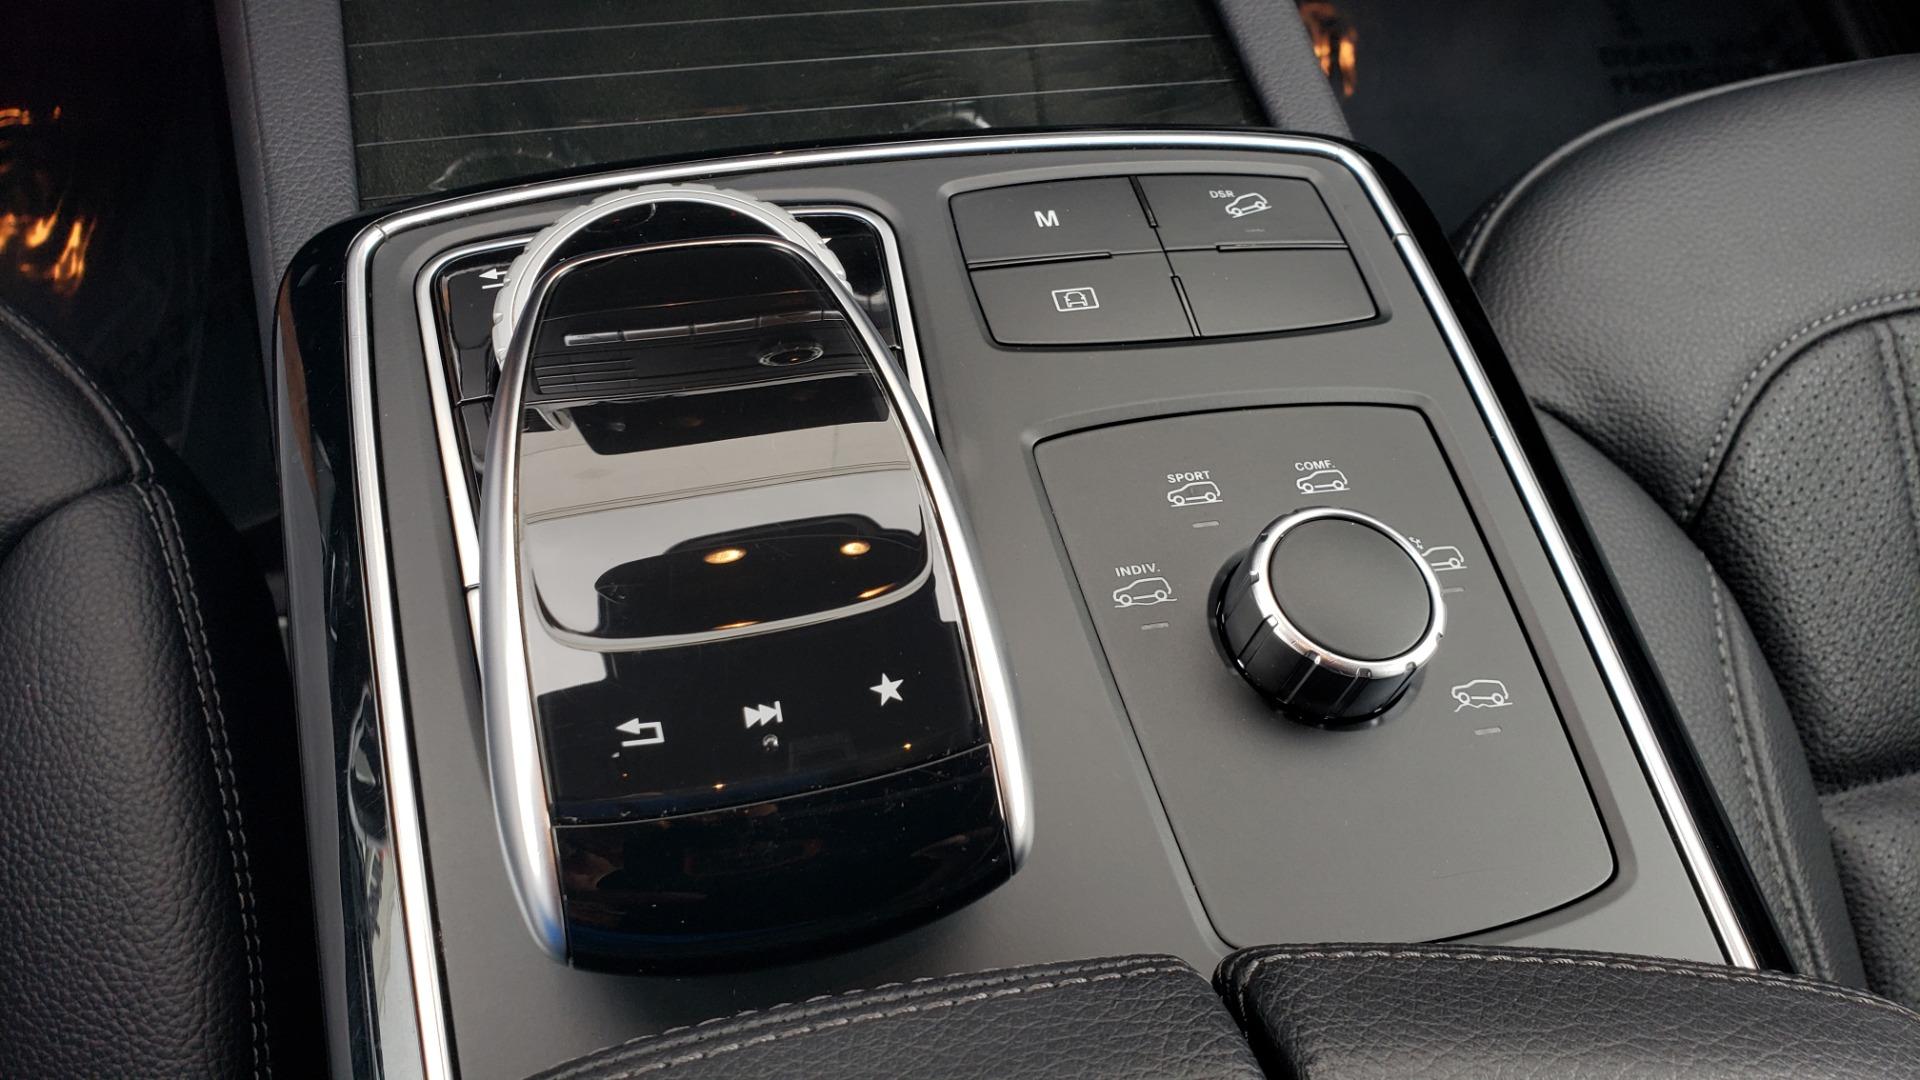 Used 2018 Mercedes-Benz GLE 350 4MATIC / PREM PKG / NAV / PARK ASST / K/H SND / HITCH / REARVIEW for sale $40,801 at Formula Imports in Charlotte NC 28227 59